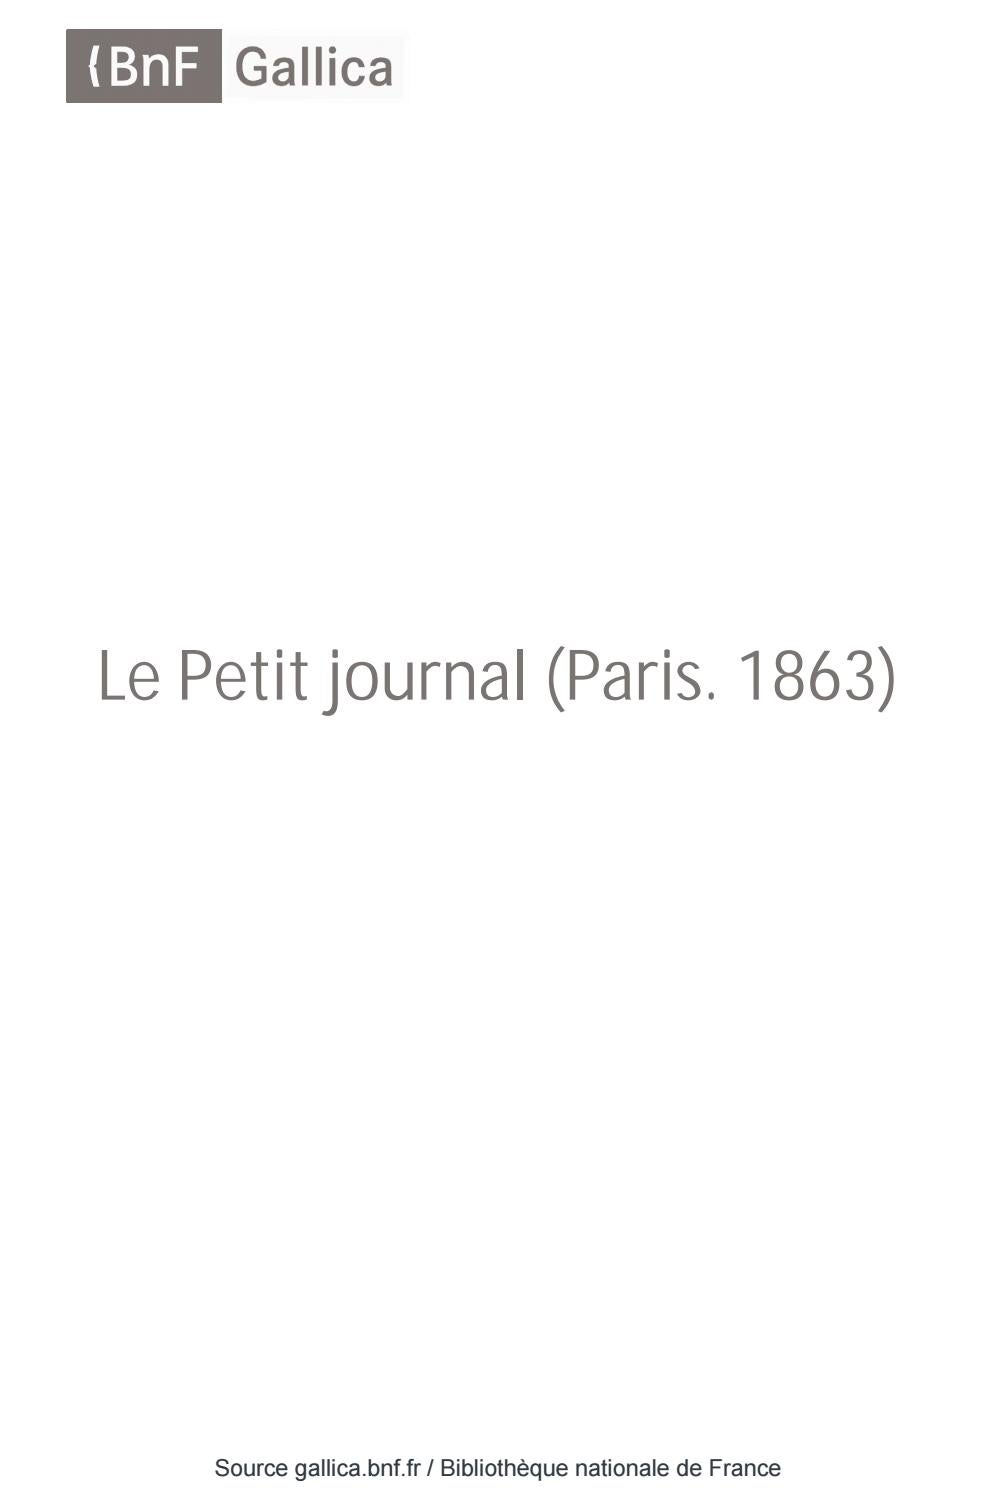 journal30041930by Président issuu AALEME Petit Le dxErWBQCeo